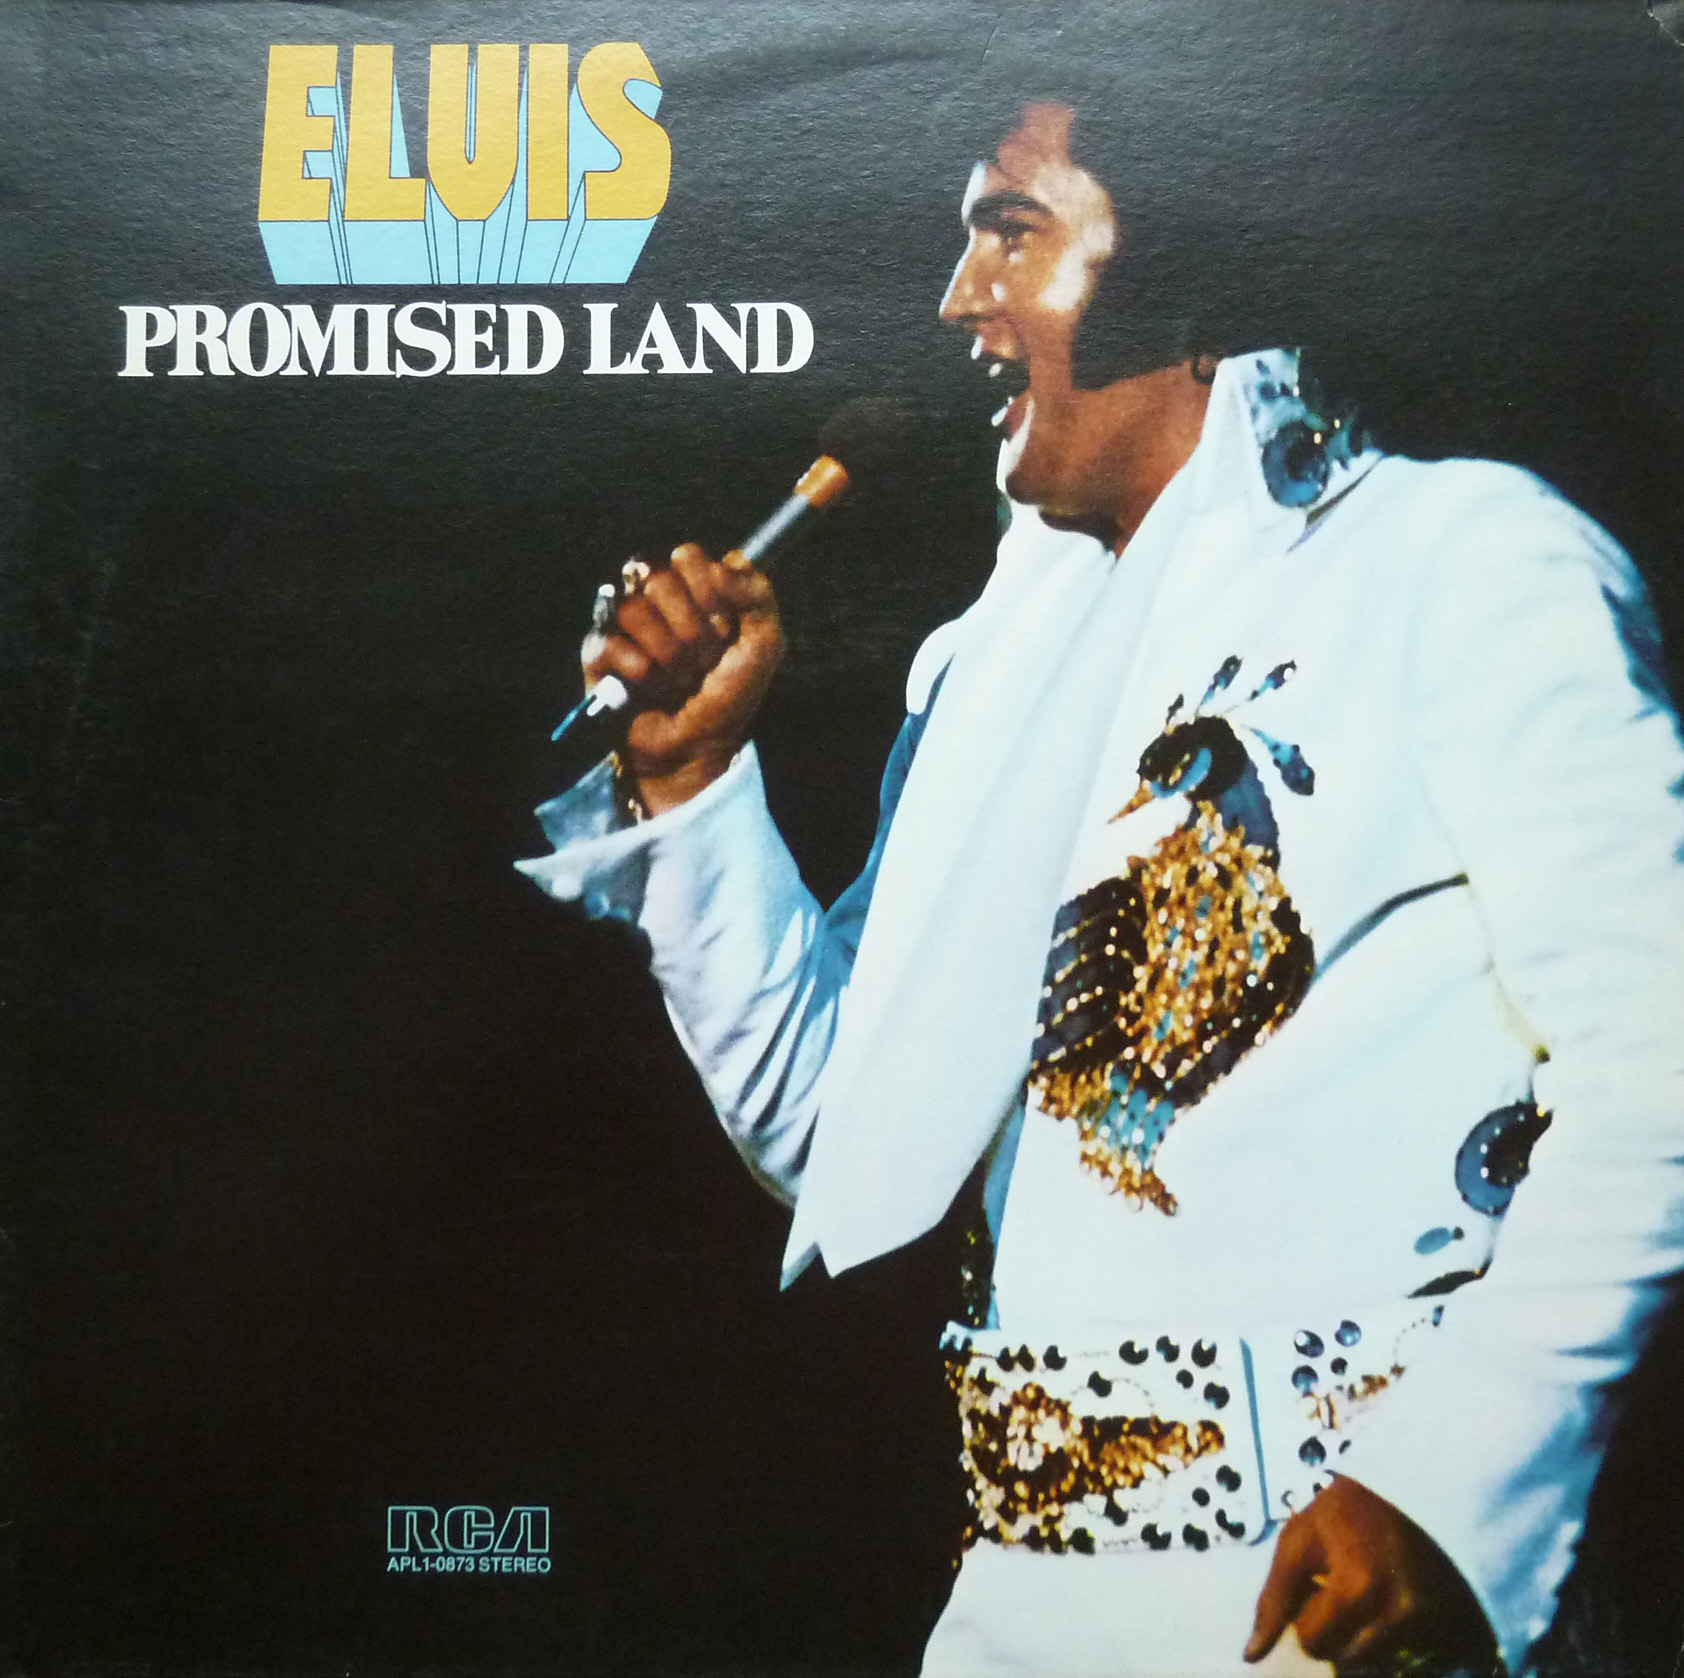 PROMISED LAND Promisedland75promofrl6cfc